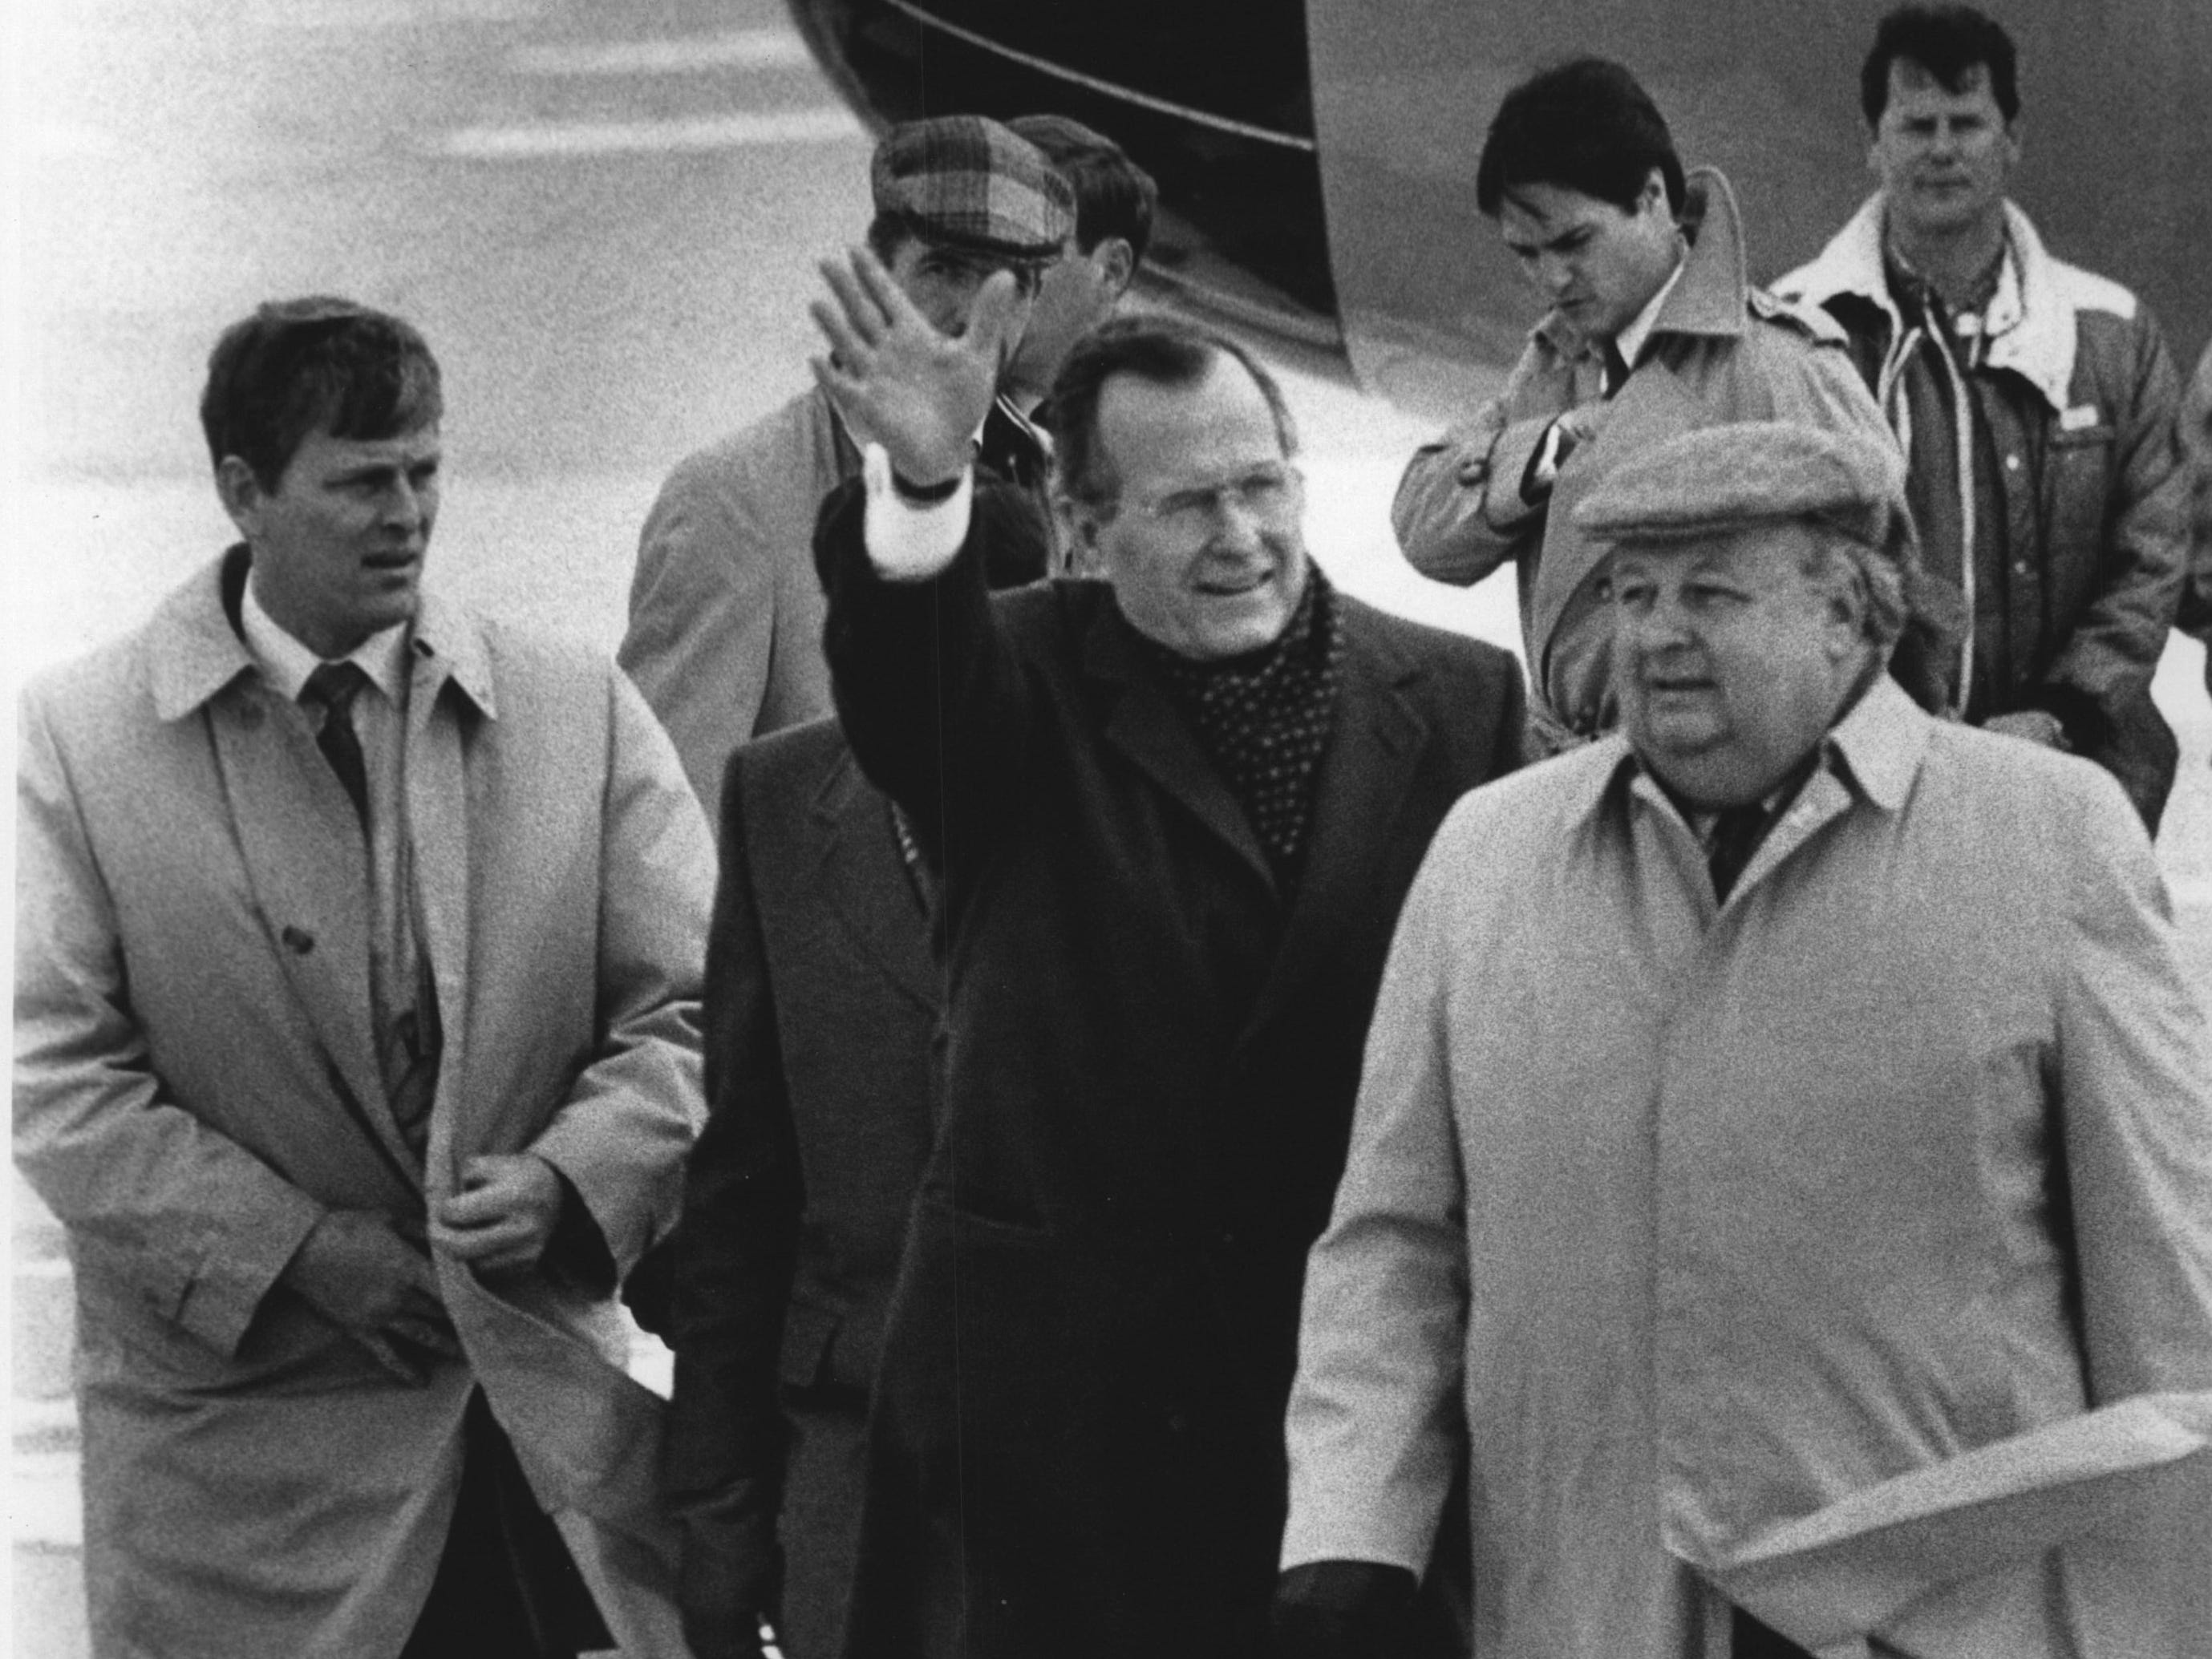 George Bush visiting Milwaukee in 1988.